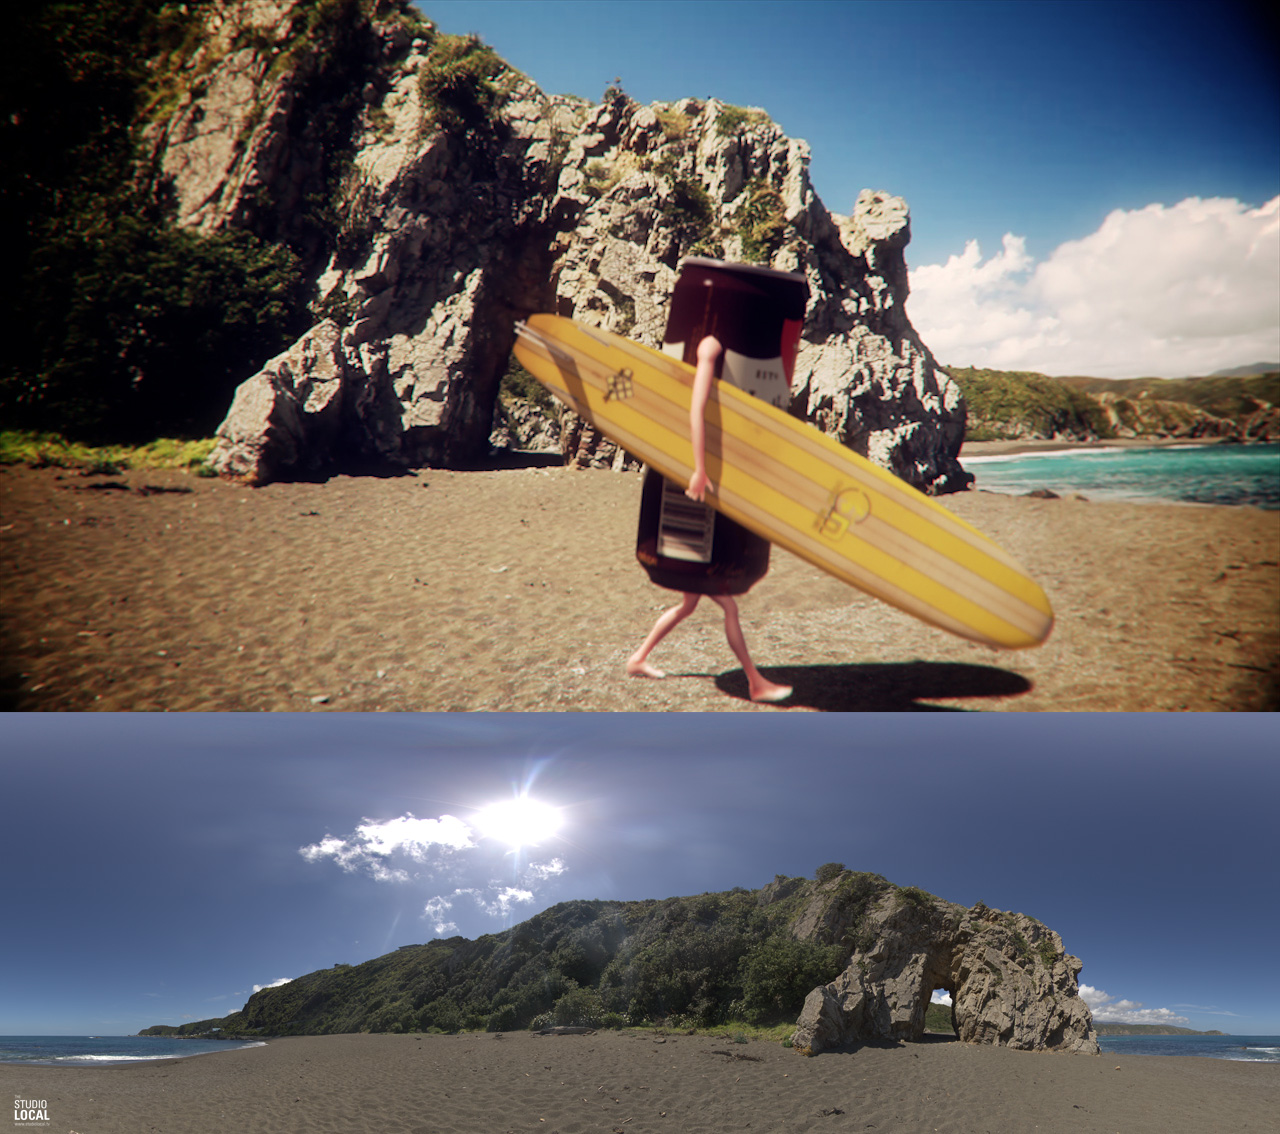 Free HDRI - Breaker Bay - Wellington New Zealand — studio local